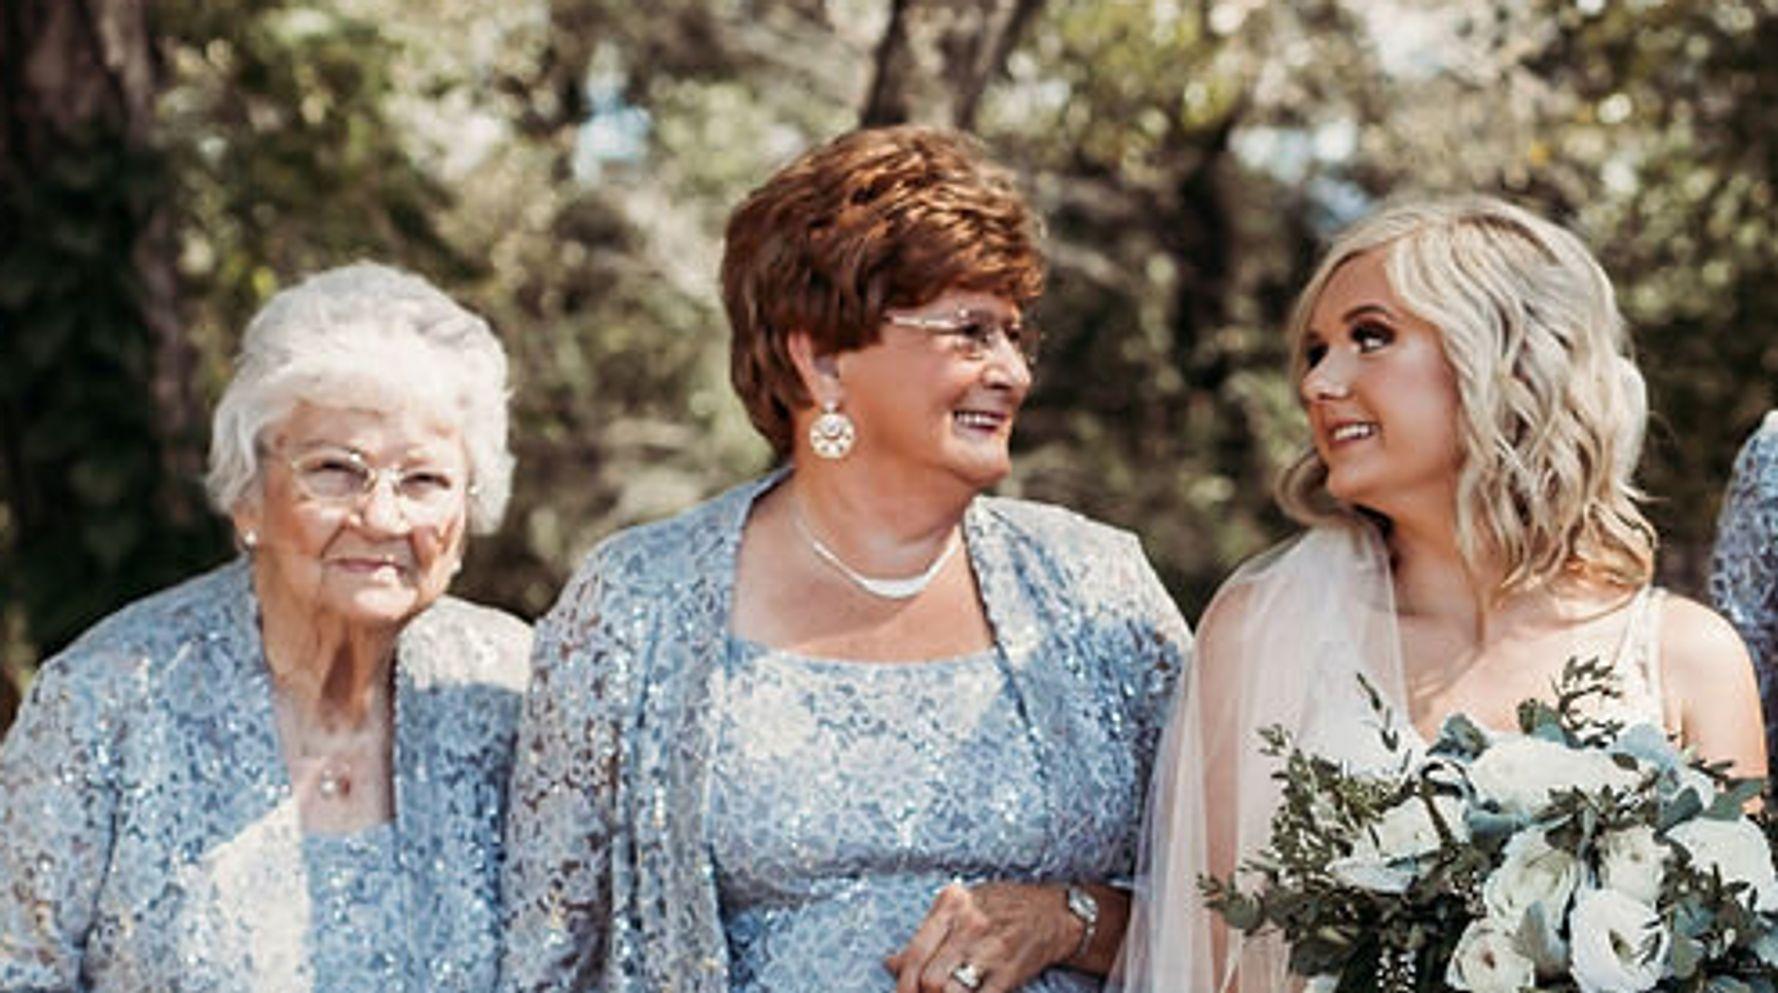 This Bride's 4 Grandmas Were The Flower Girls At Her Wedding